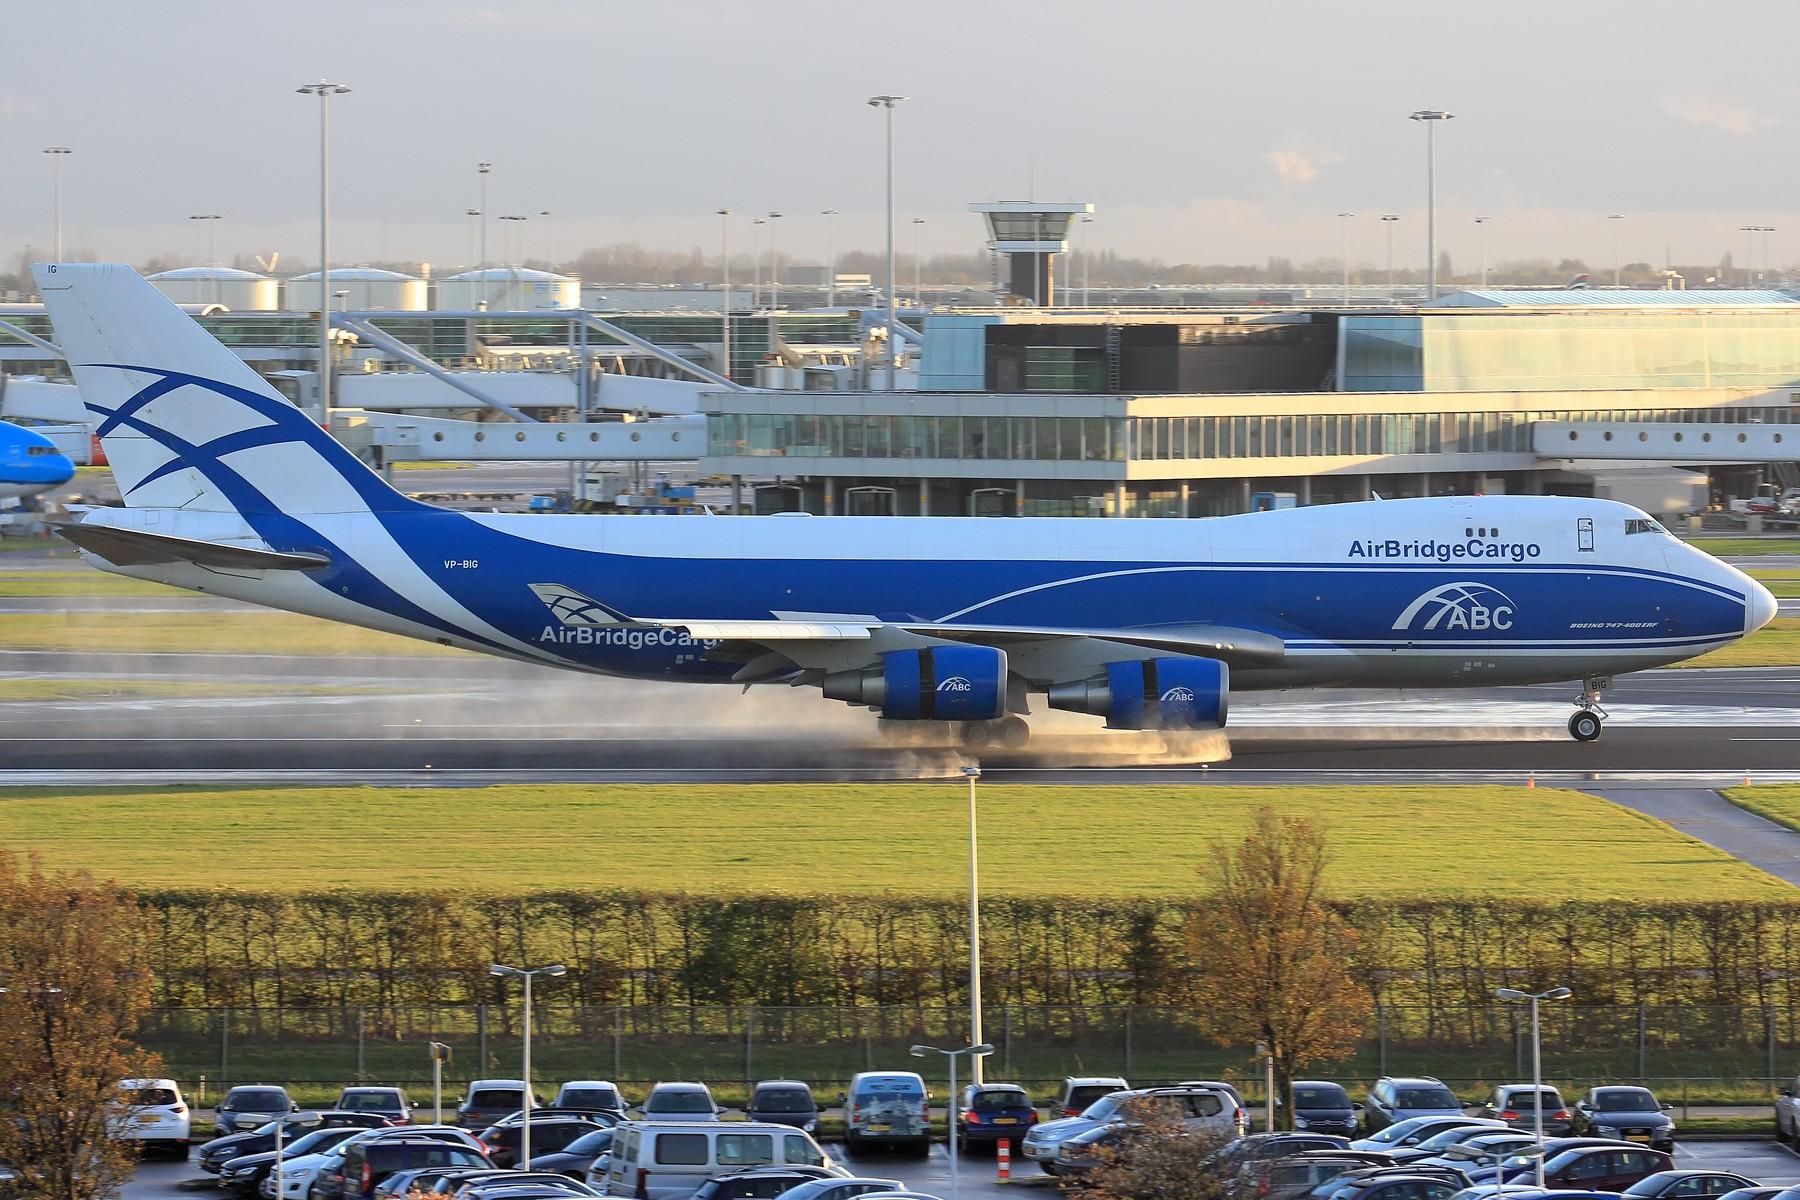 Re:[原创]【AMS】伪塔台视角吹水几张 1800大图 BOEING 747-400 VP-BIG 荷兰阿姆斯特丹史基浦机场